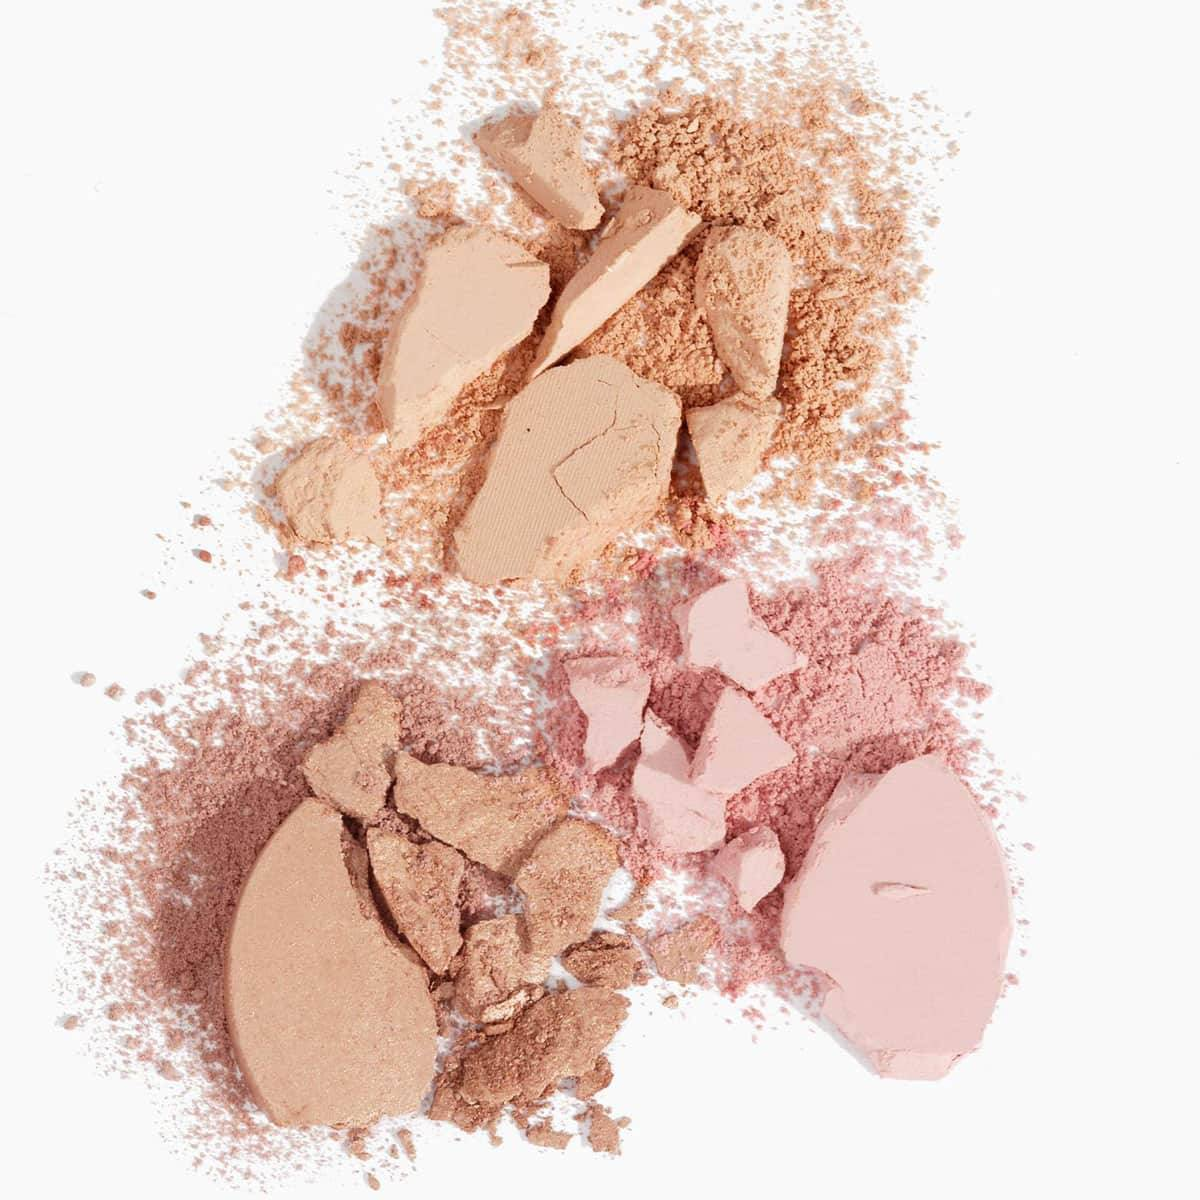 La Roche Posay Citlivá Toleriane Make-up PUDR_Fixace 333787241378